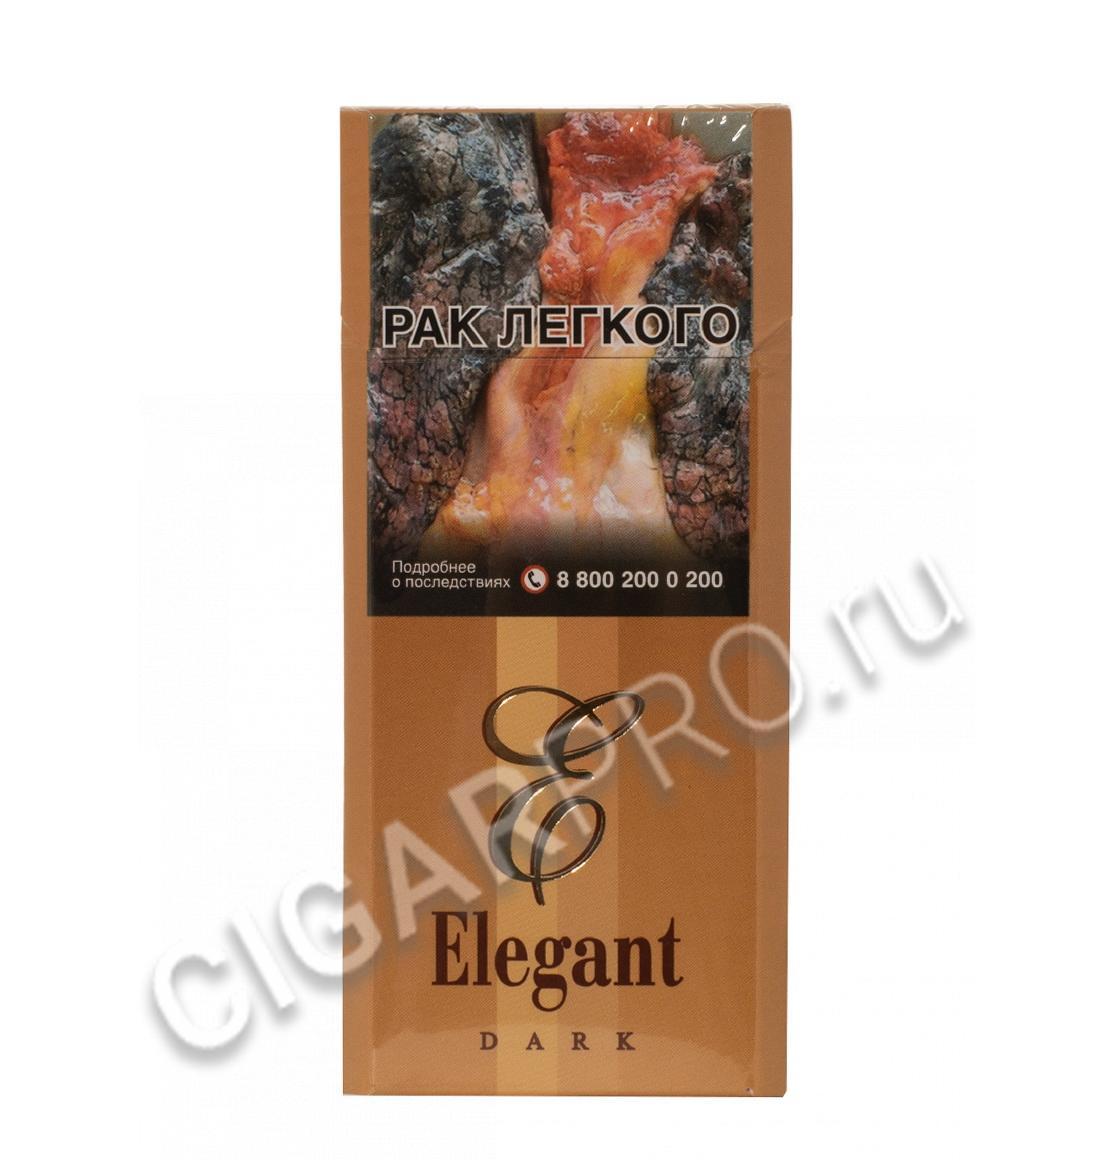 элегант дарк сигареты купить